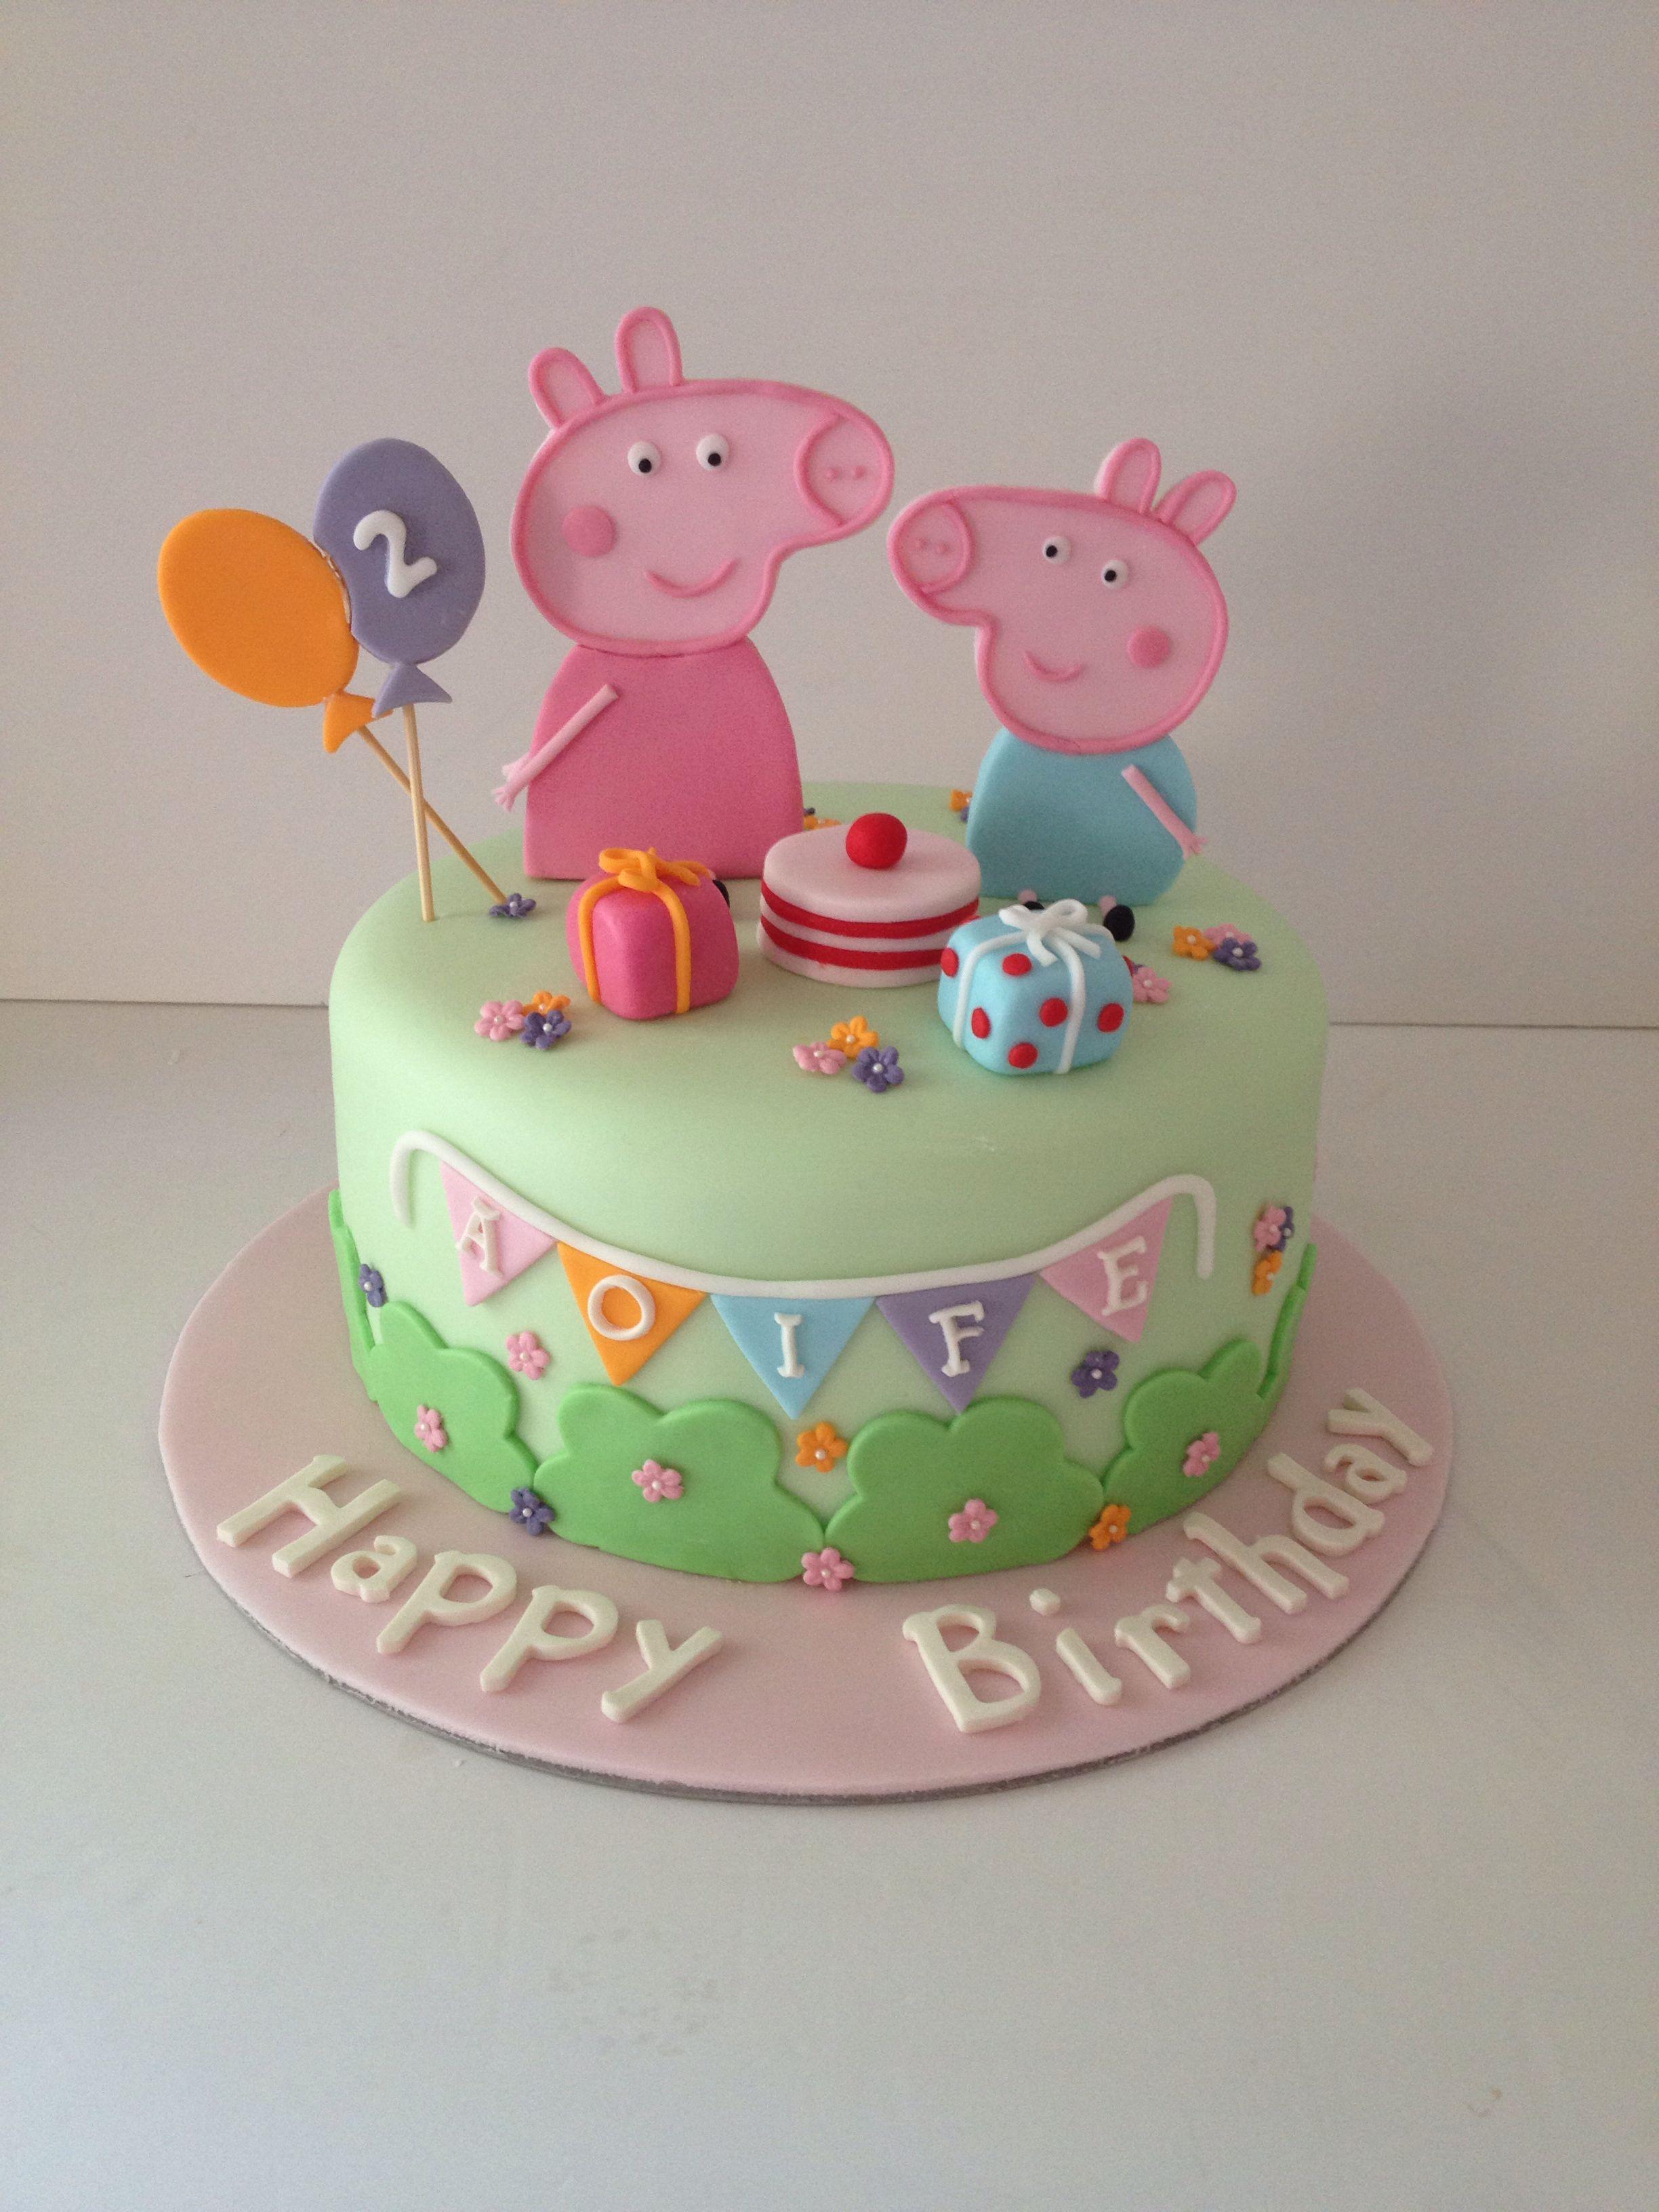 Eras Birthday #peppapig